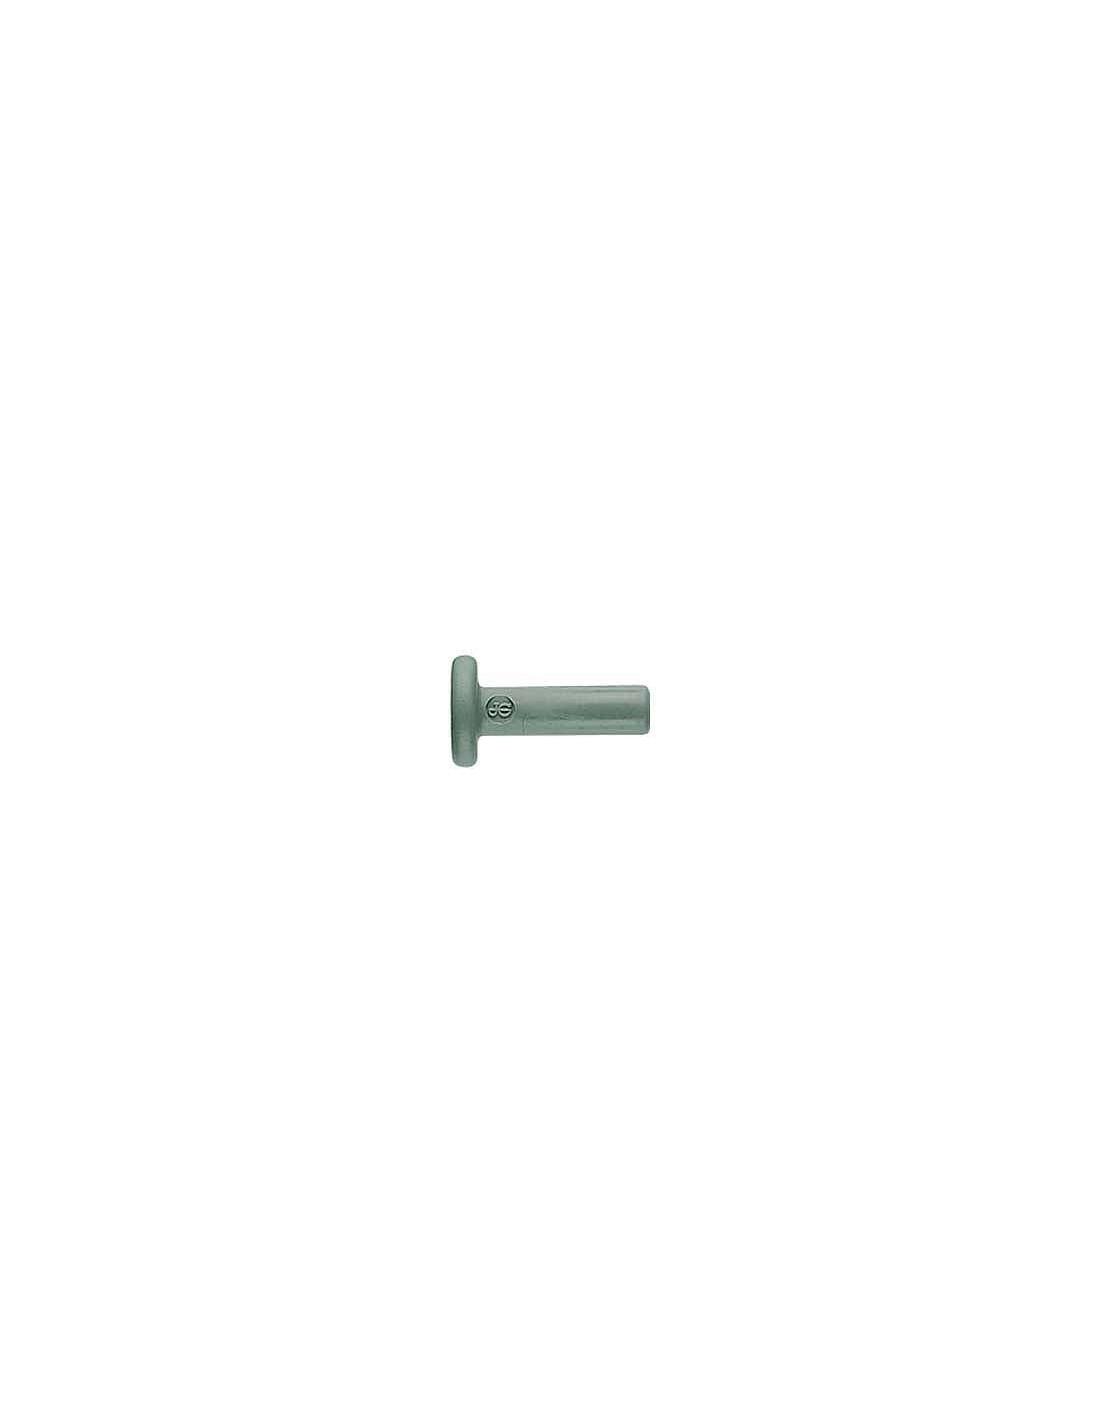 "UPP00051 - JG plug 9.5 mm (3/8"") (pi0812s)"